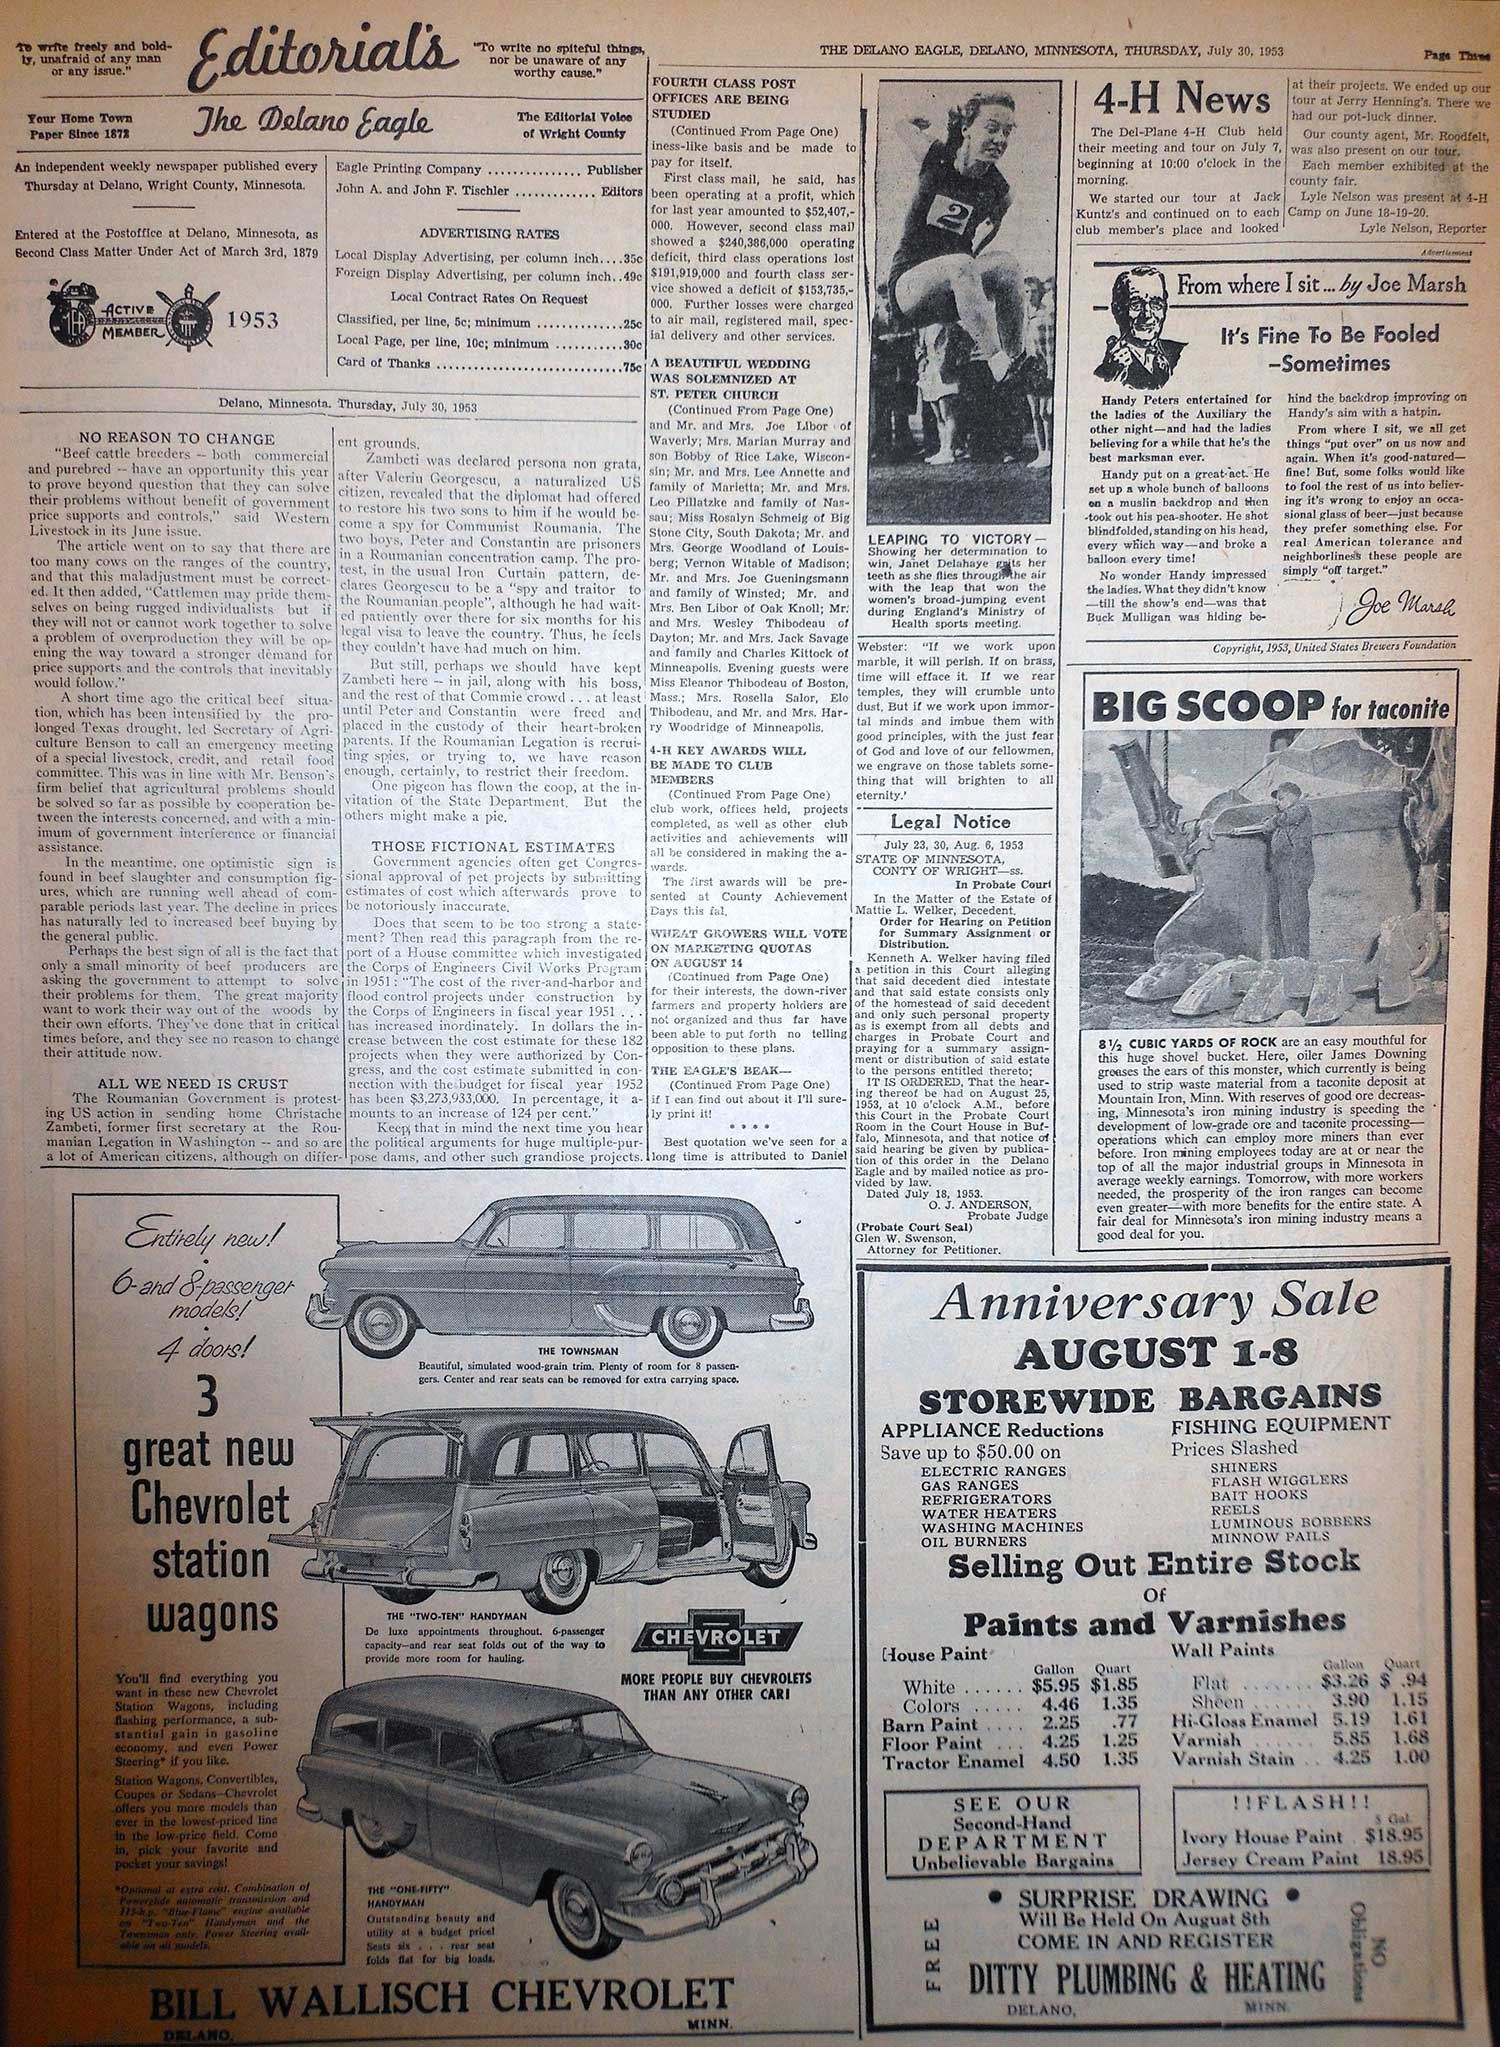 7/30/1953, p3